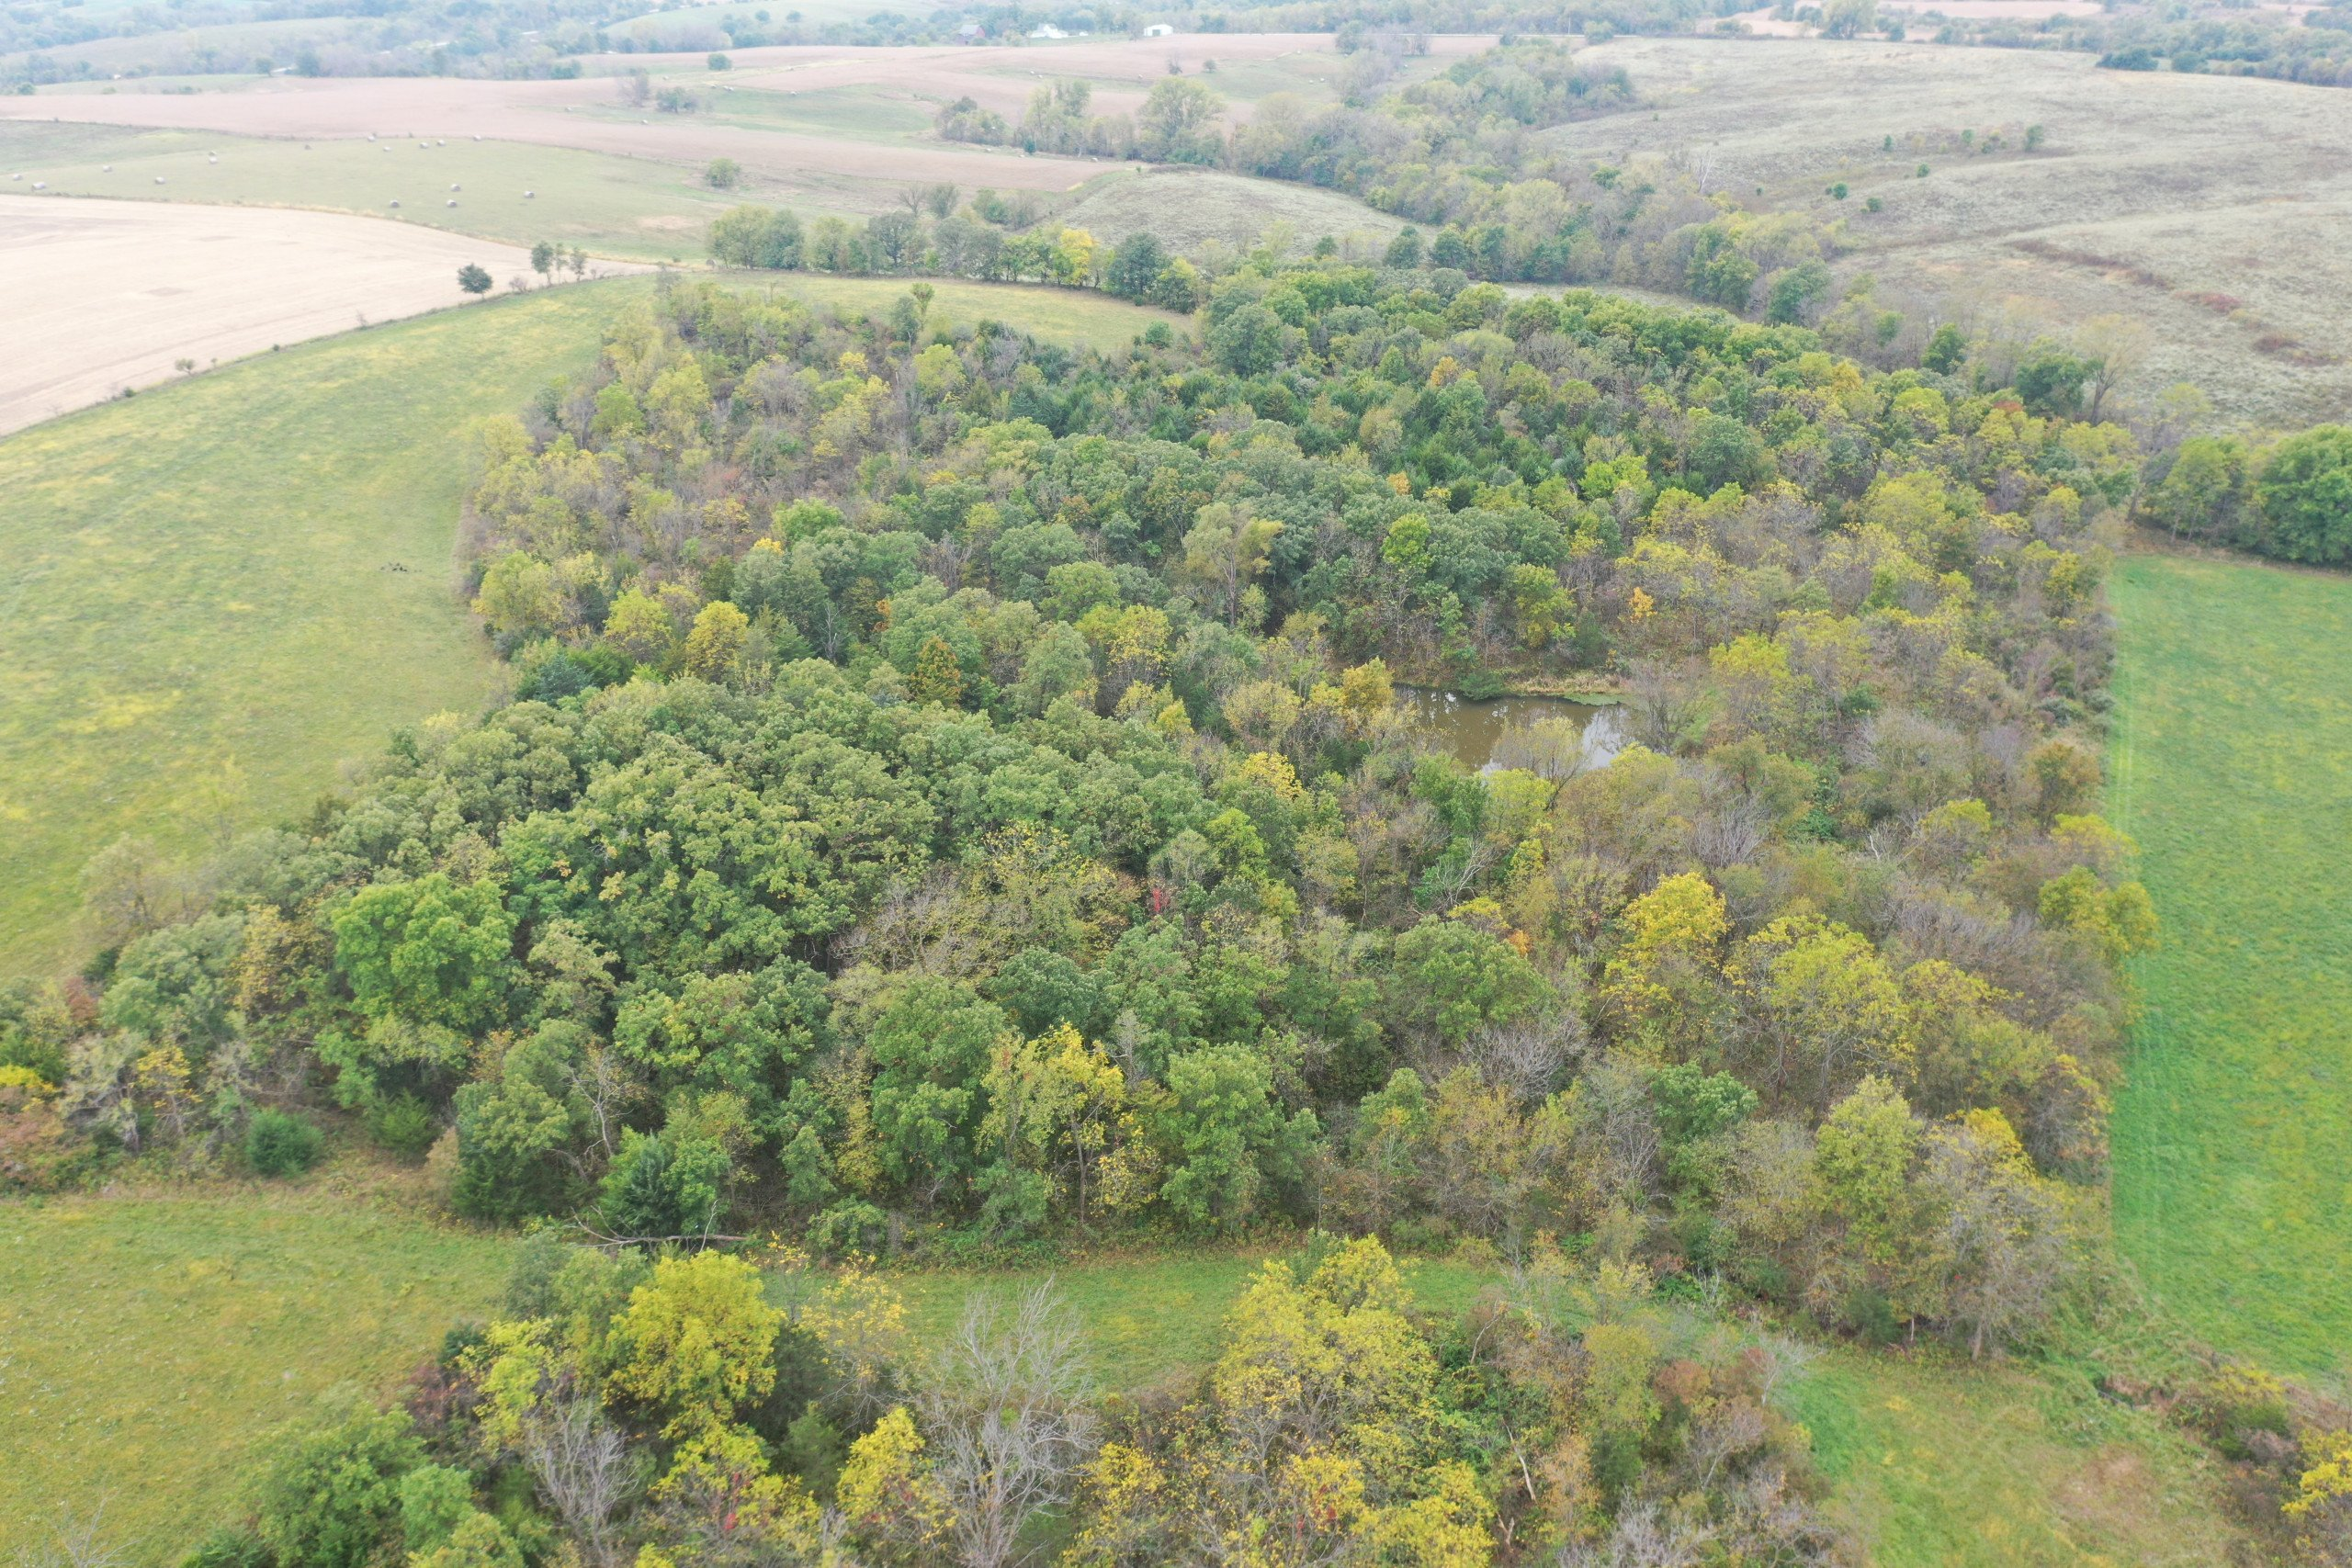 land-warren-county-iowa-200-acres-listing-number-15810-DJI_0597-2.jpg